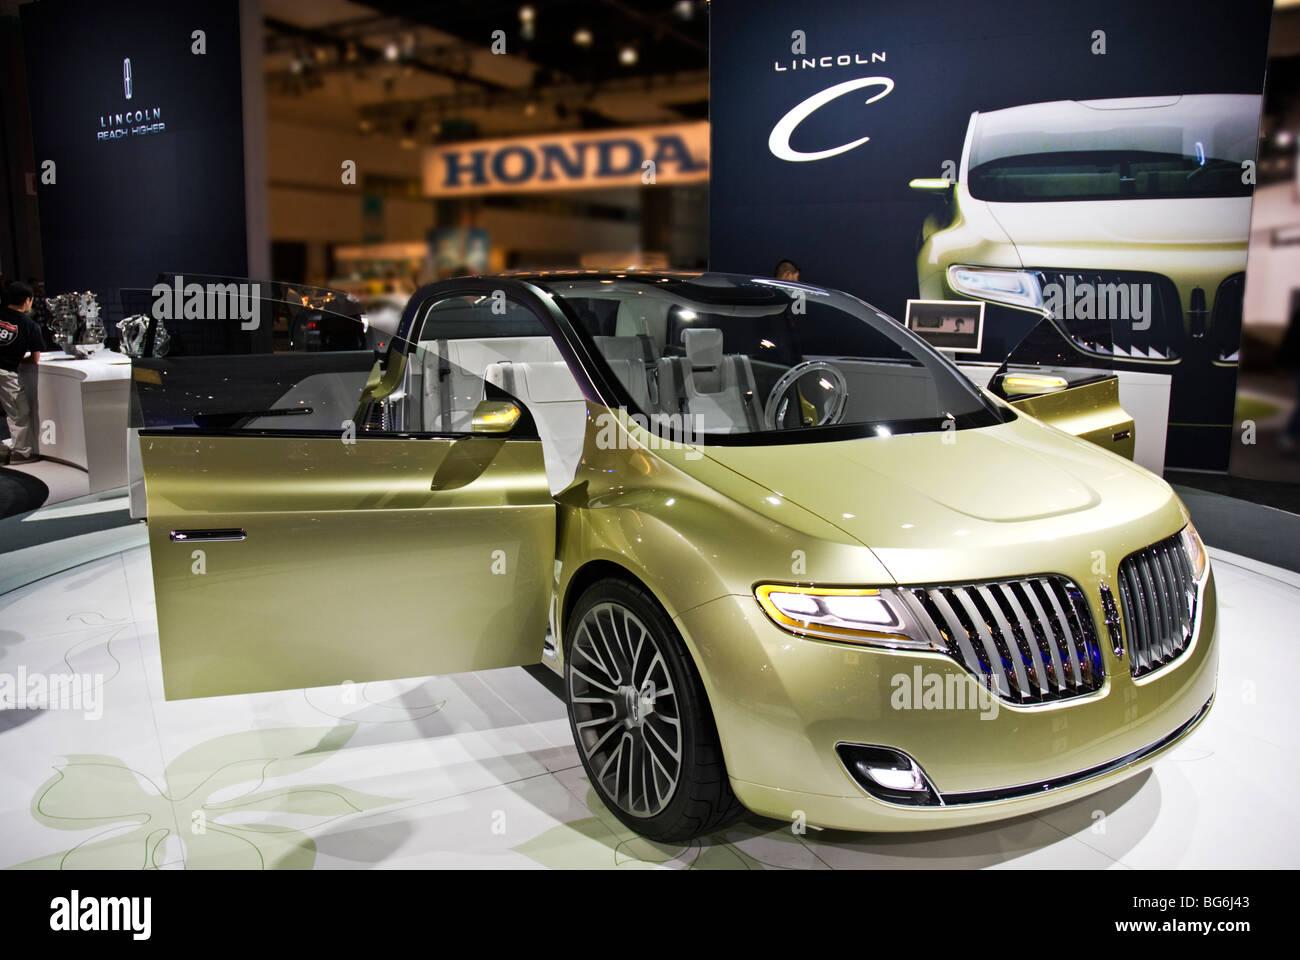 http://c8.alamy.com/comp/BG6J43/the-lincoln-c-concept-car-at-the-2009-la-auto-show-in-the-los-angeles-BG6J43.jpg